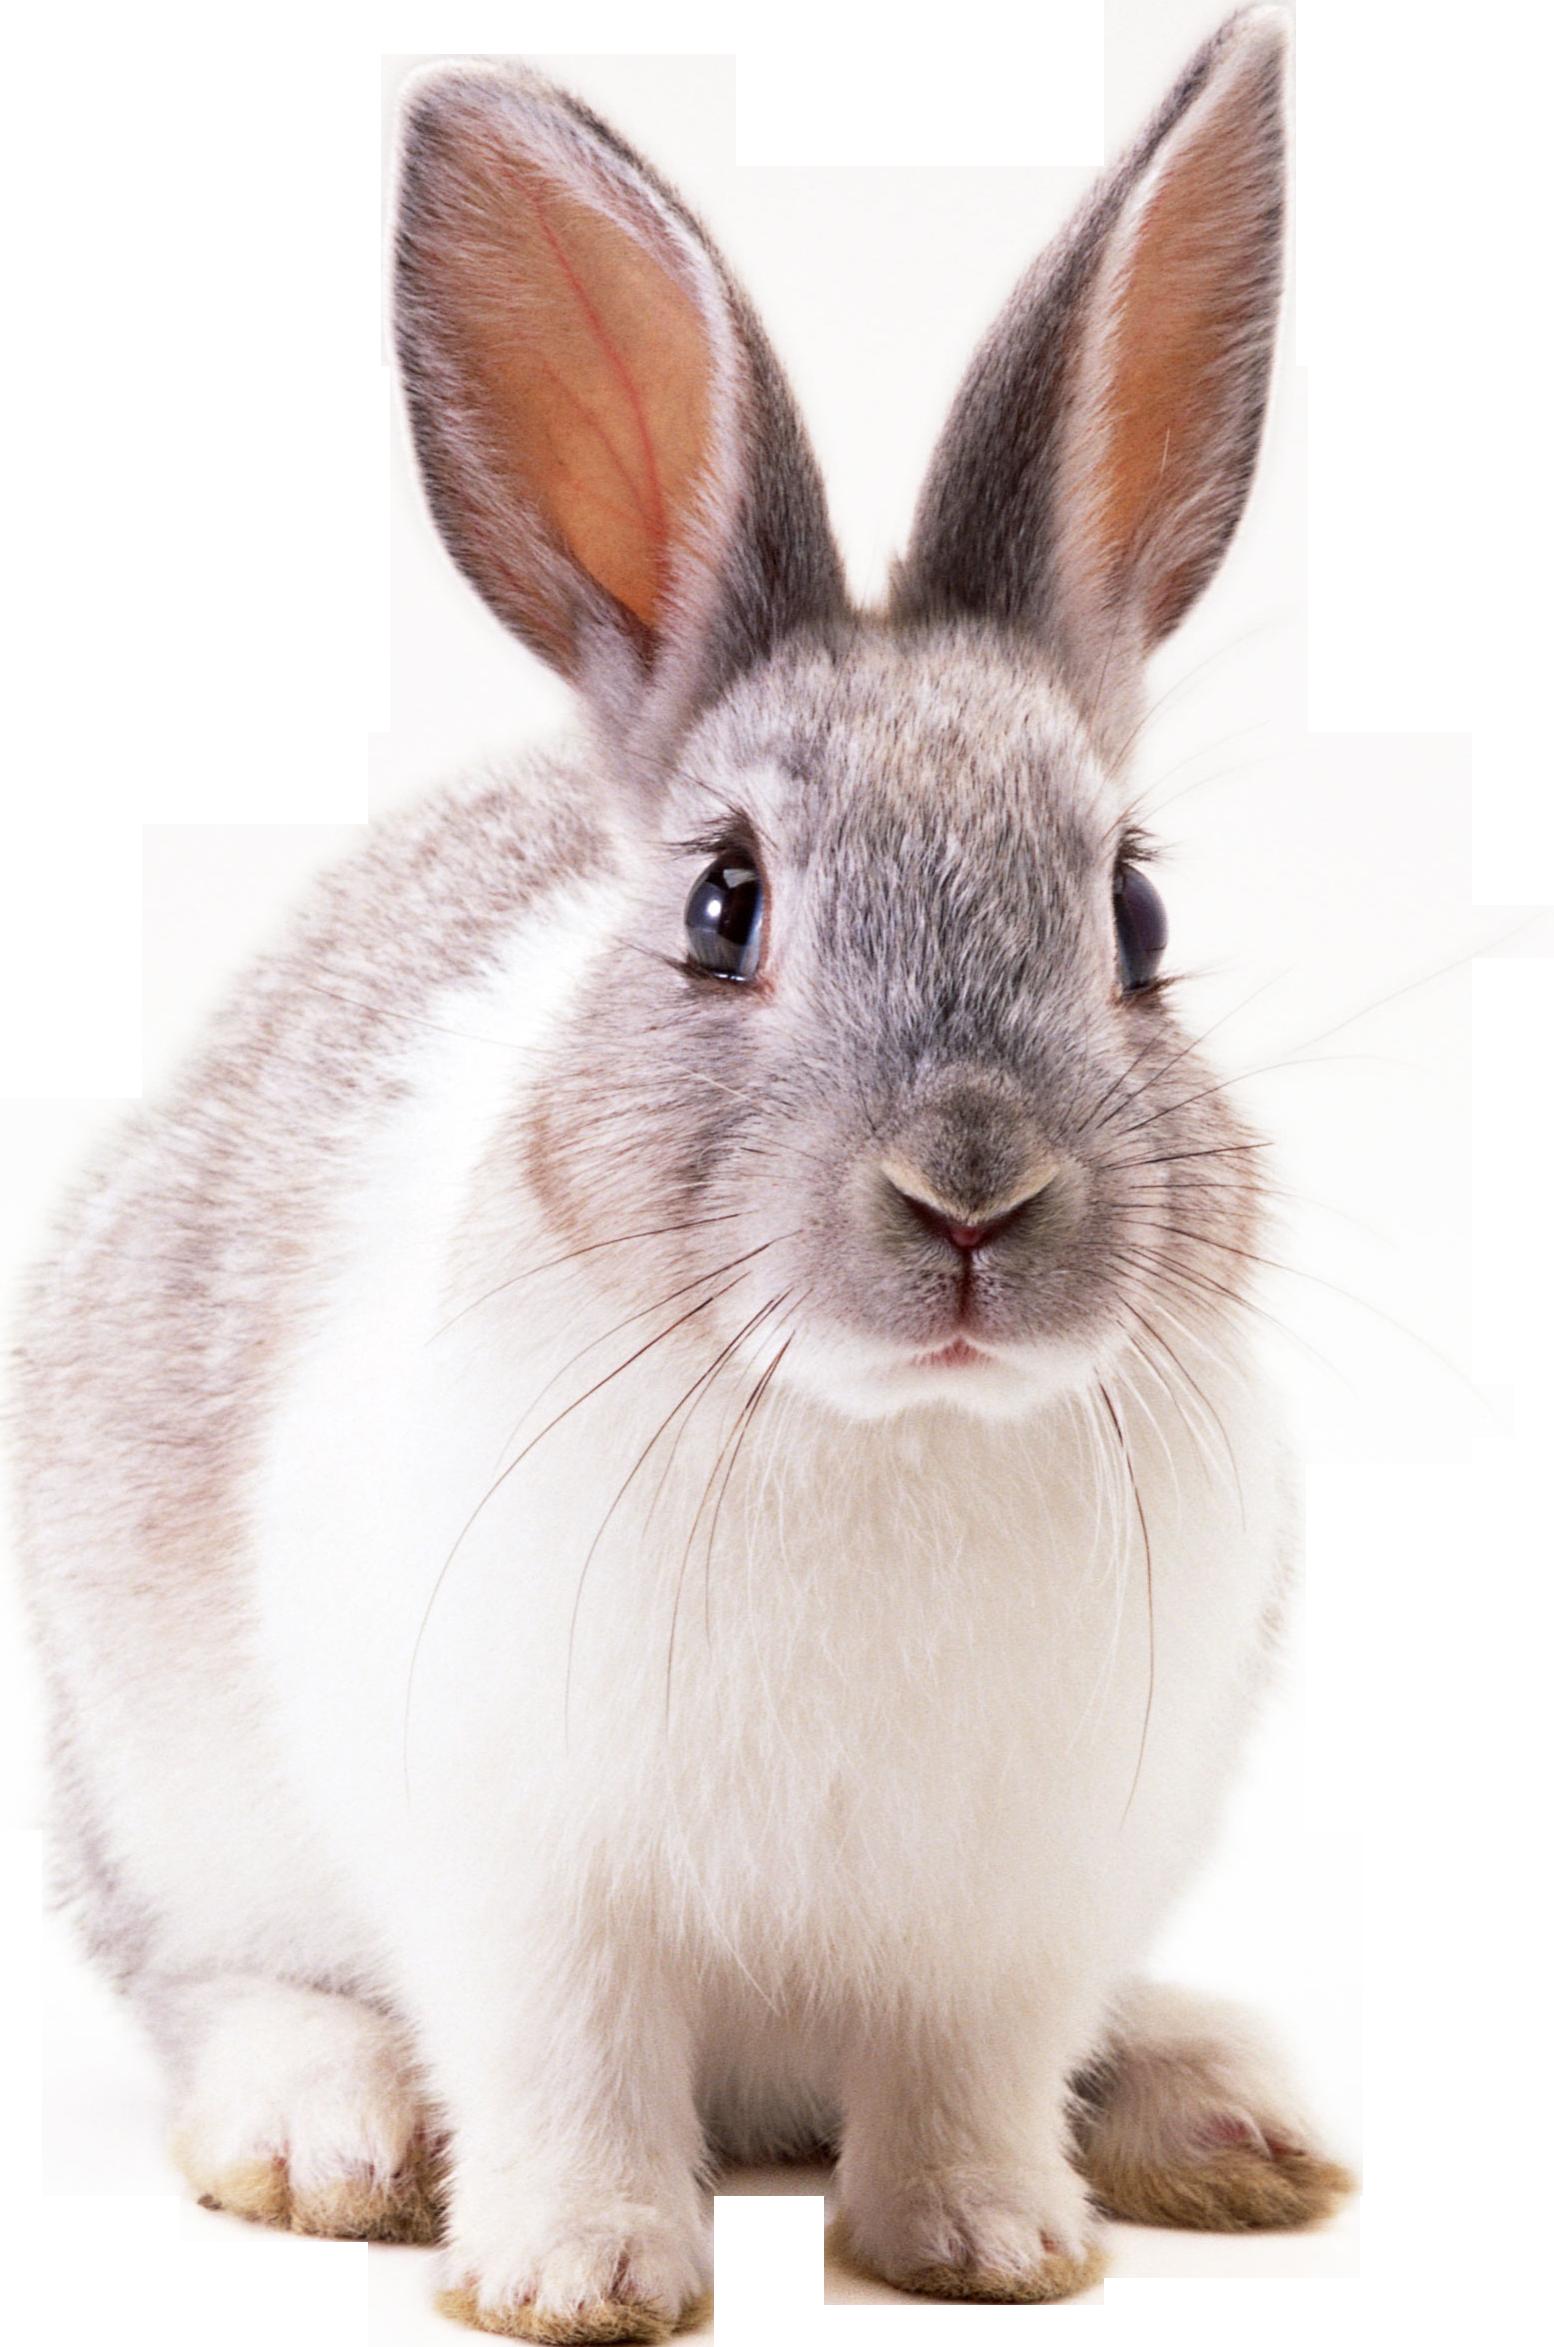 Rabbit Png image #40335